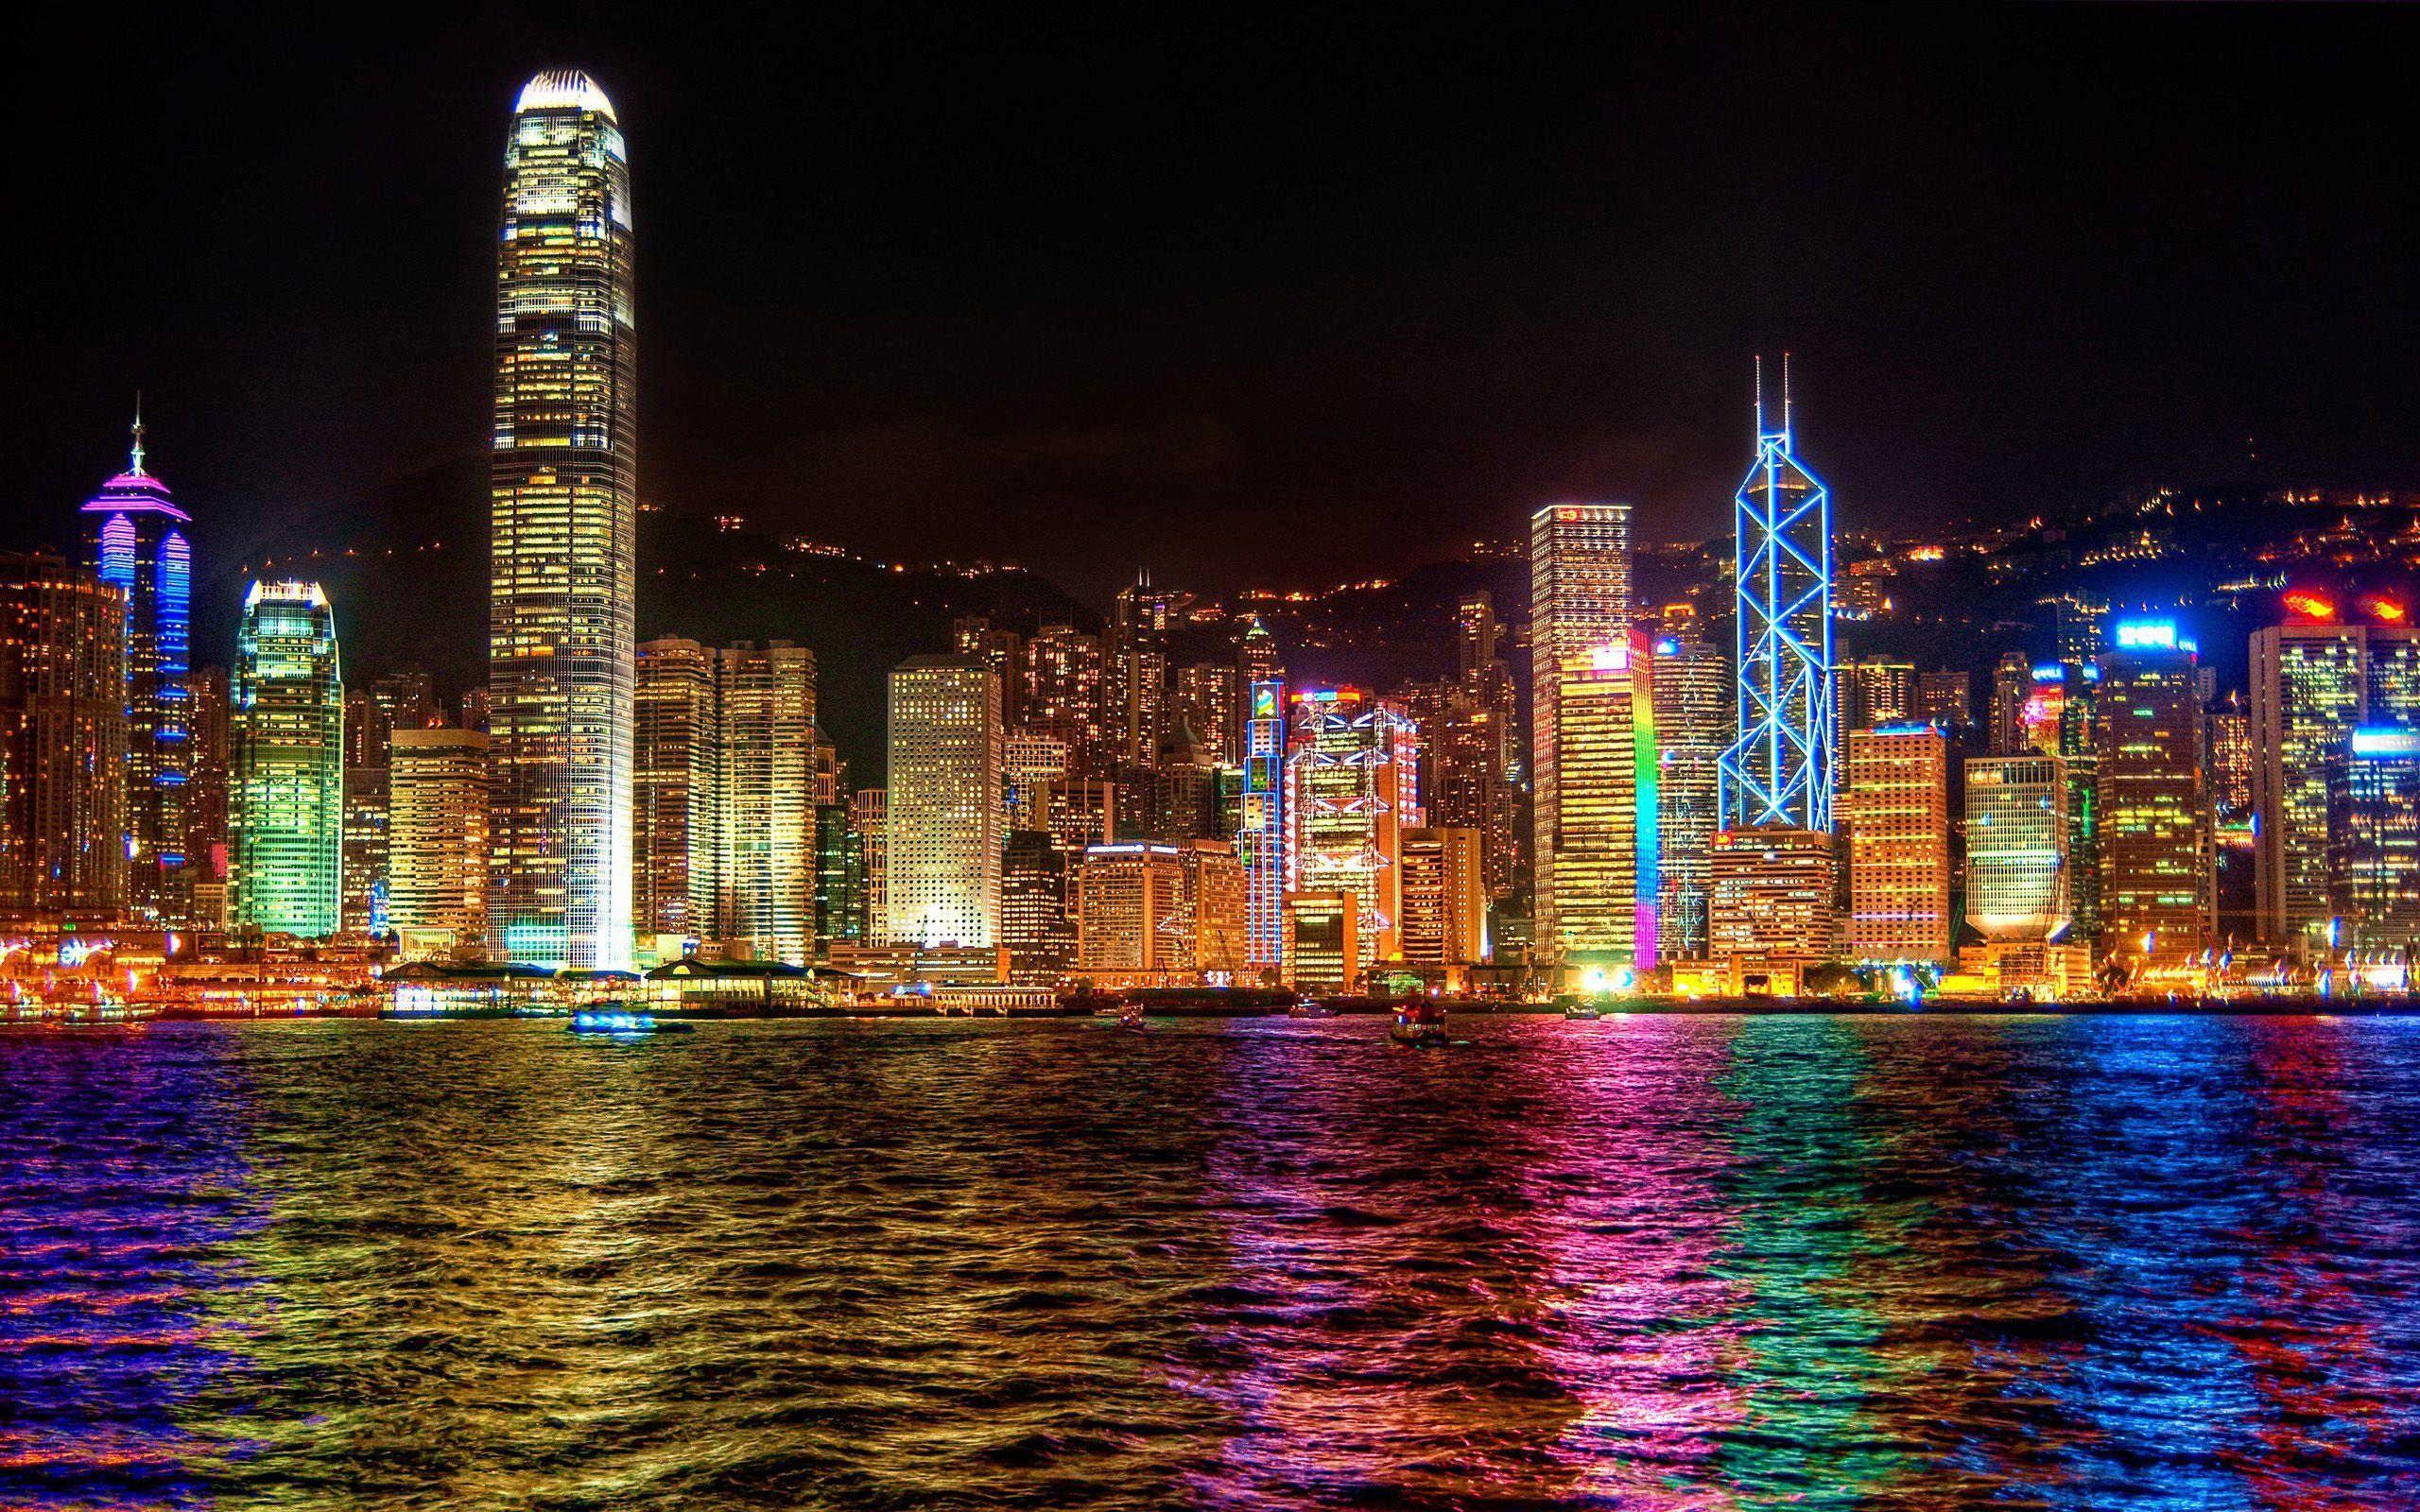 Hongkong City Night Skyline Hd Wallpaper 2560x1600px Hong Kong Night Skyline Paris At Night Skyline